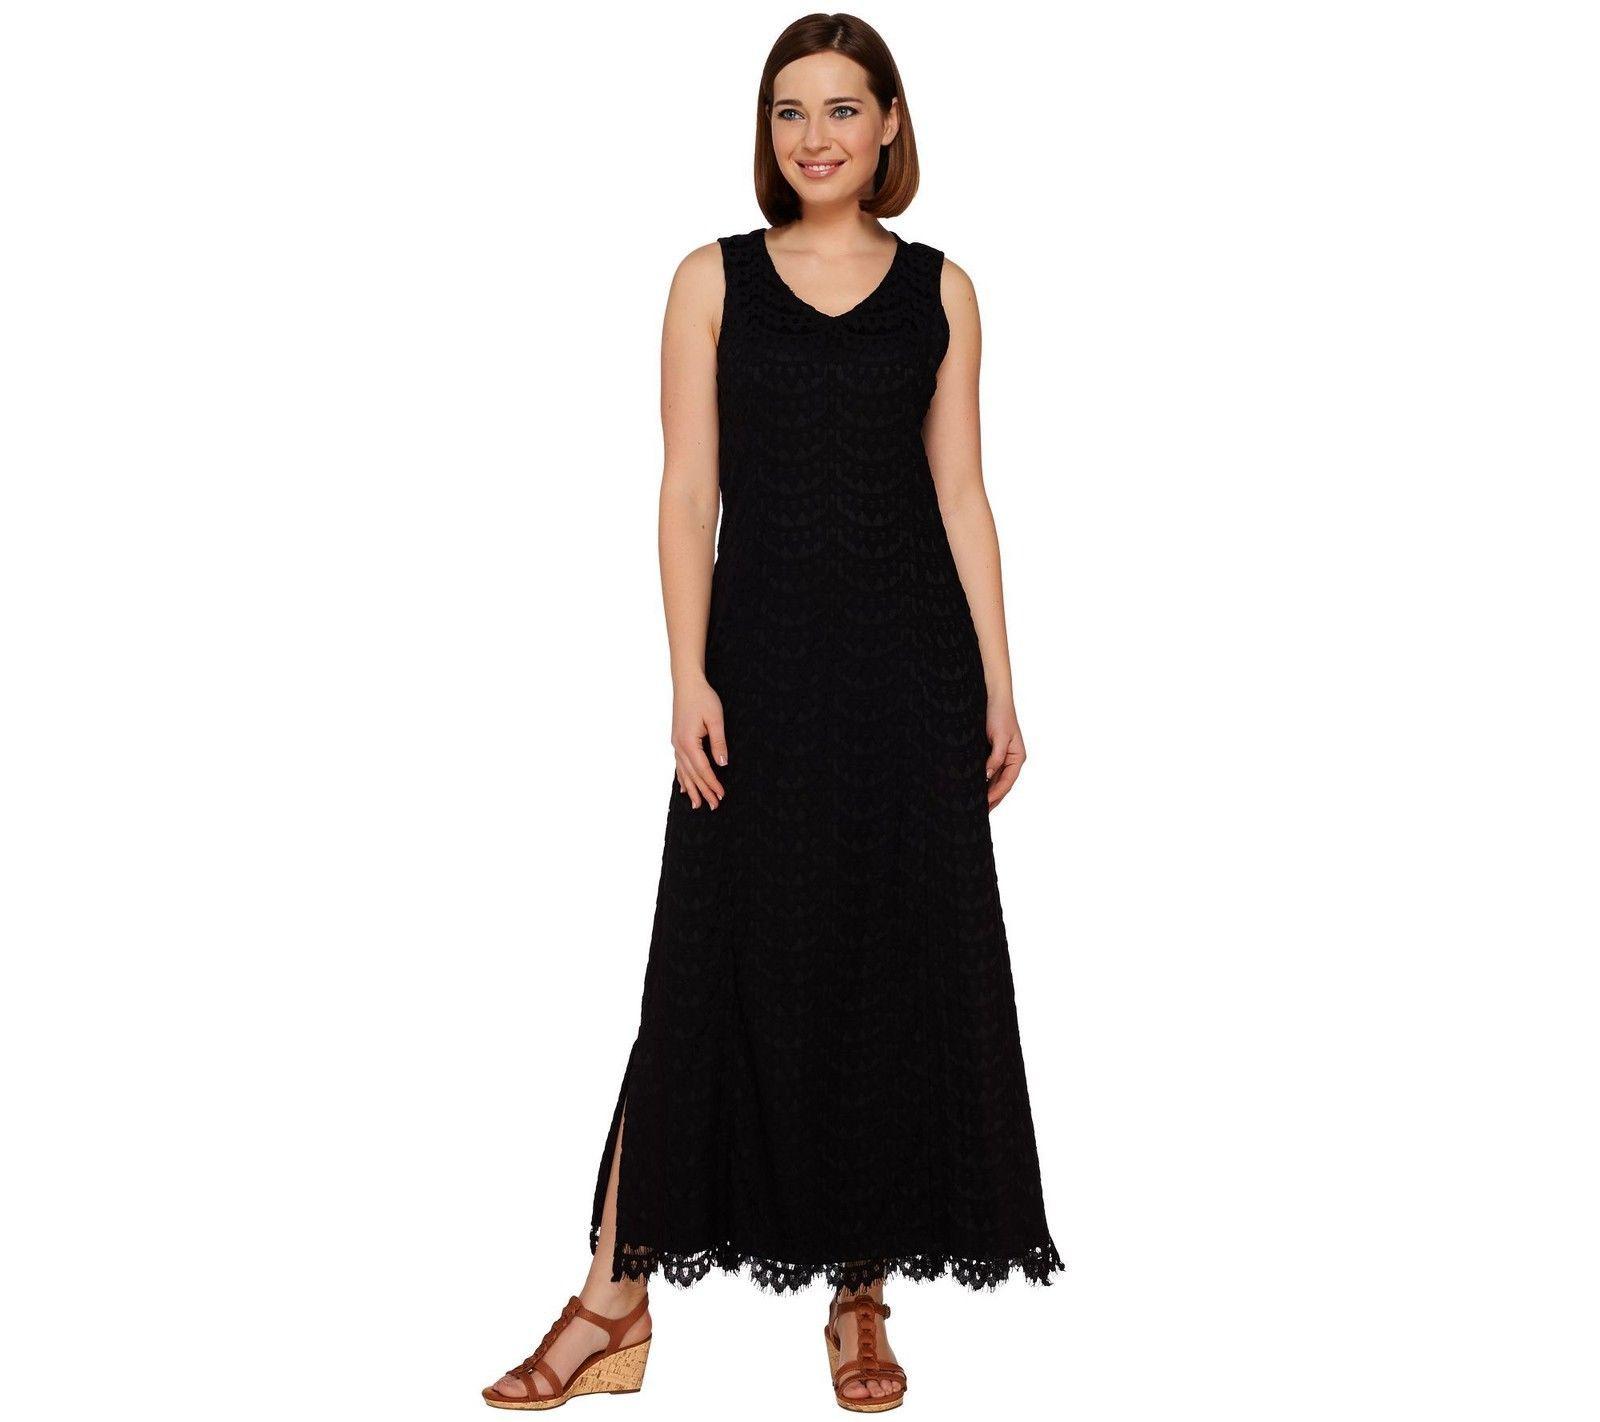 Isaac Mizrahi Gorgeous Petite Lace Maxi Dress Scallop Hem Black Pm New A277291 Lace Maxi Dress Scalloped Dress Dresses [ 1422 x 1600 Pixel ]